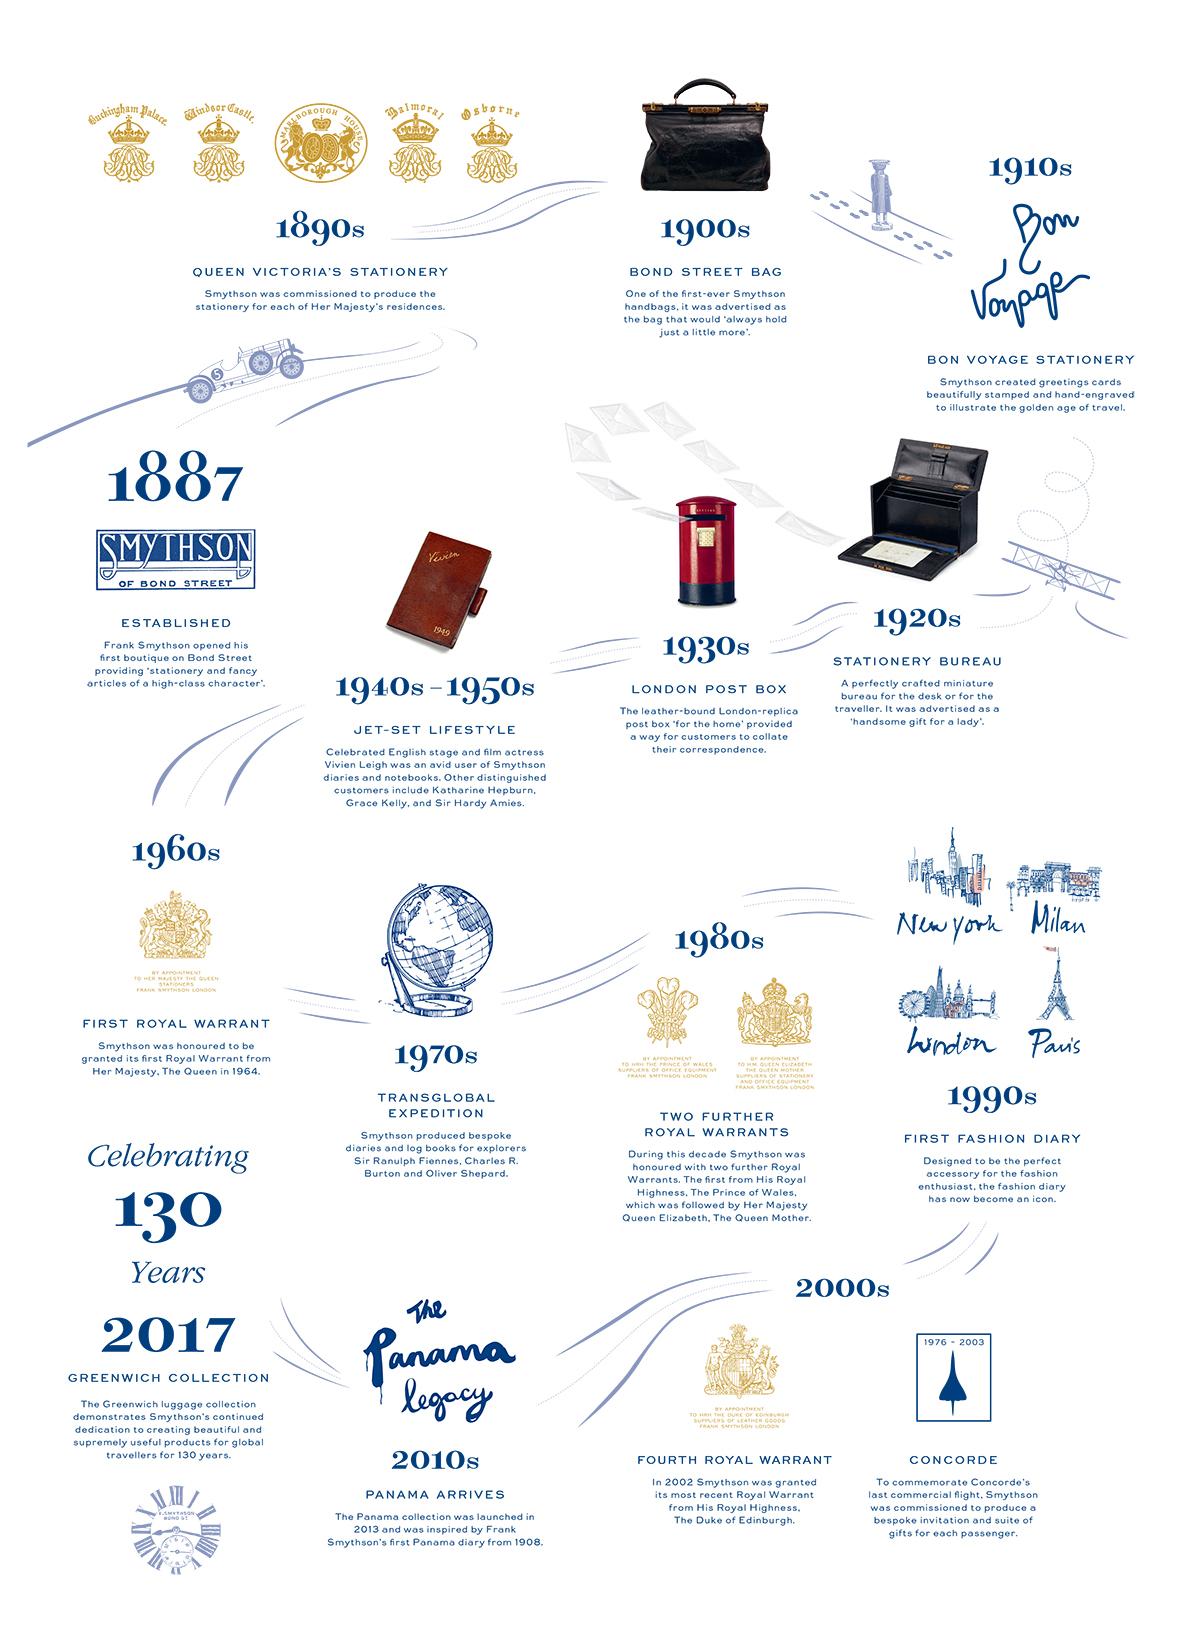 130 years of Smythson